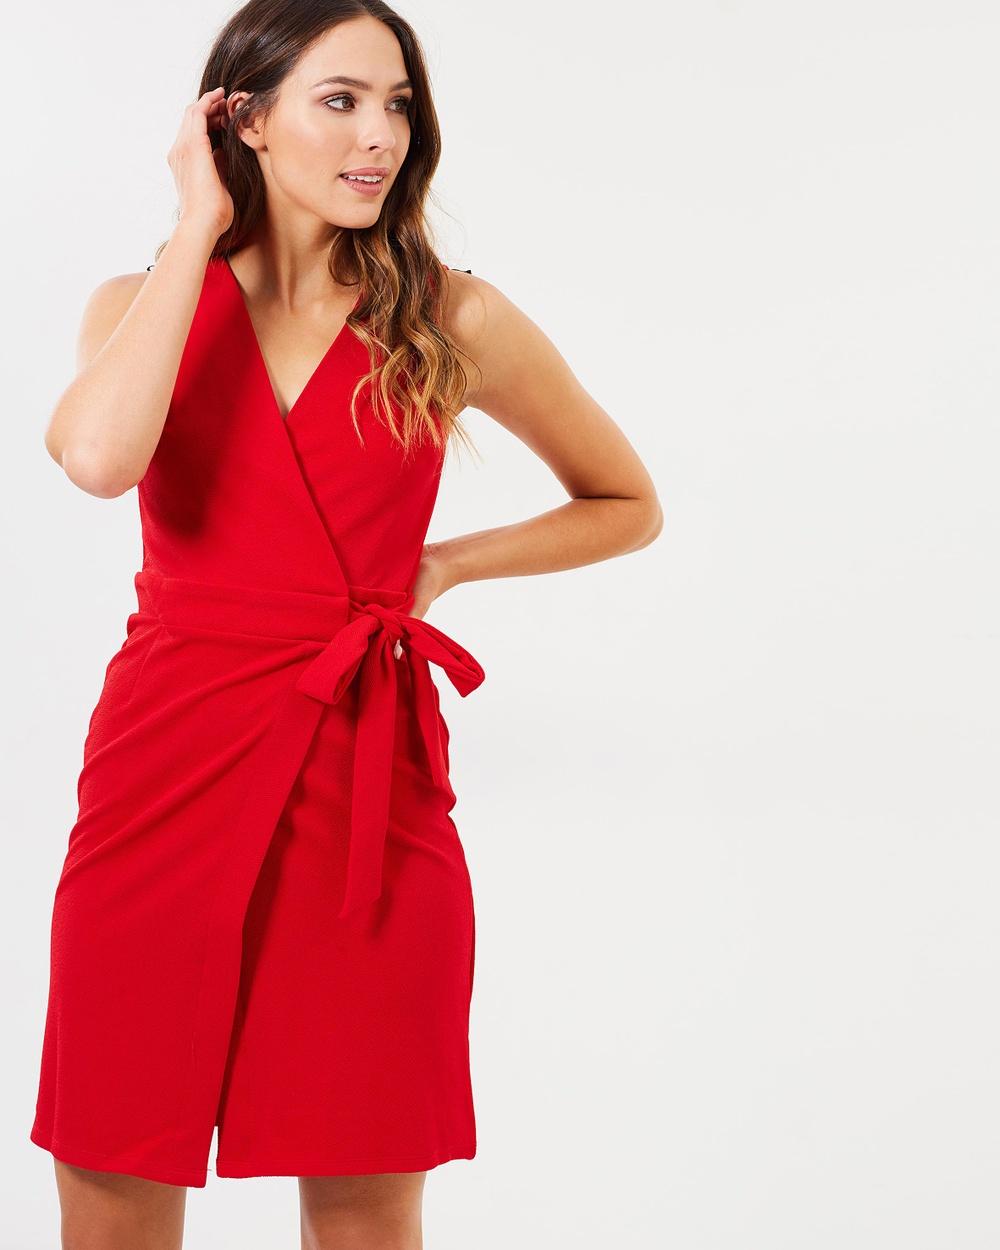 Dorothy Perkins Sleeveless Wrap Dress Dresses Red Sleeveless Wrap Dress